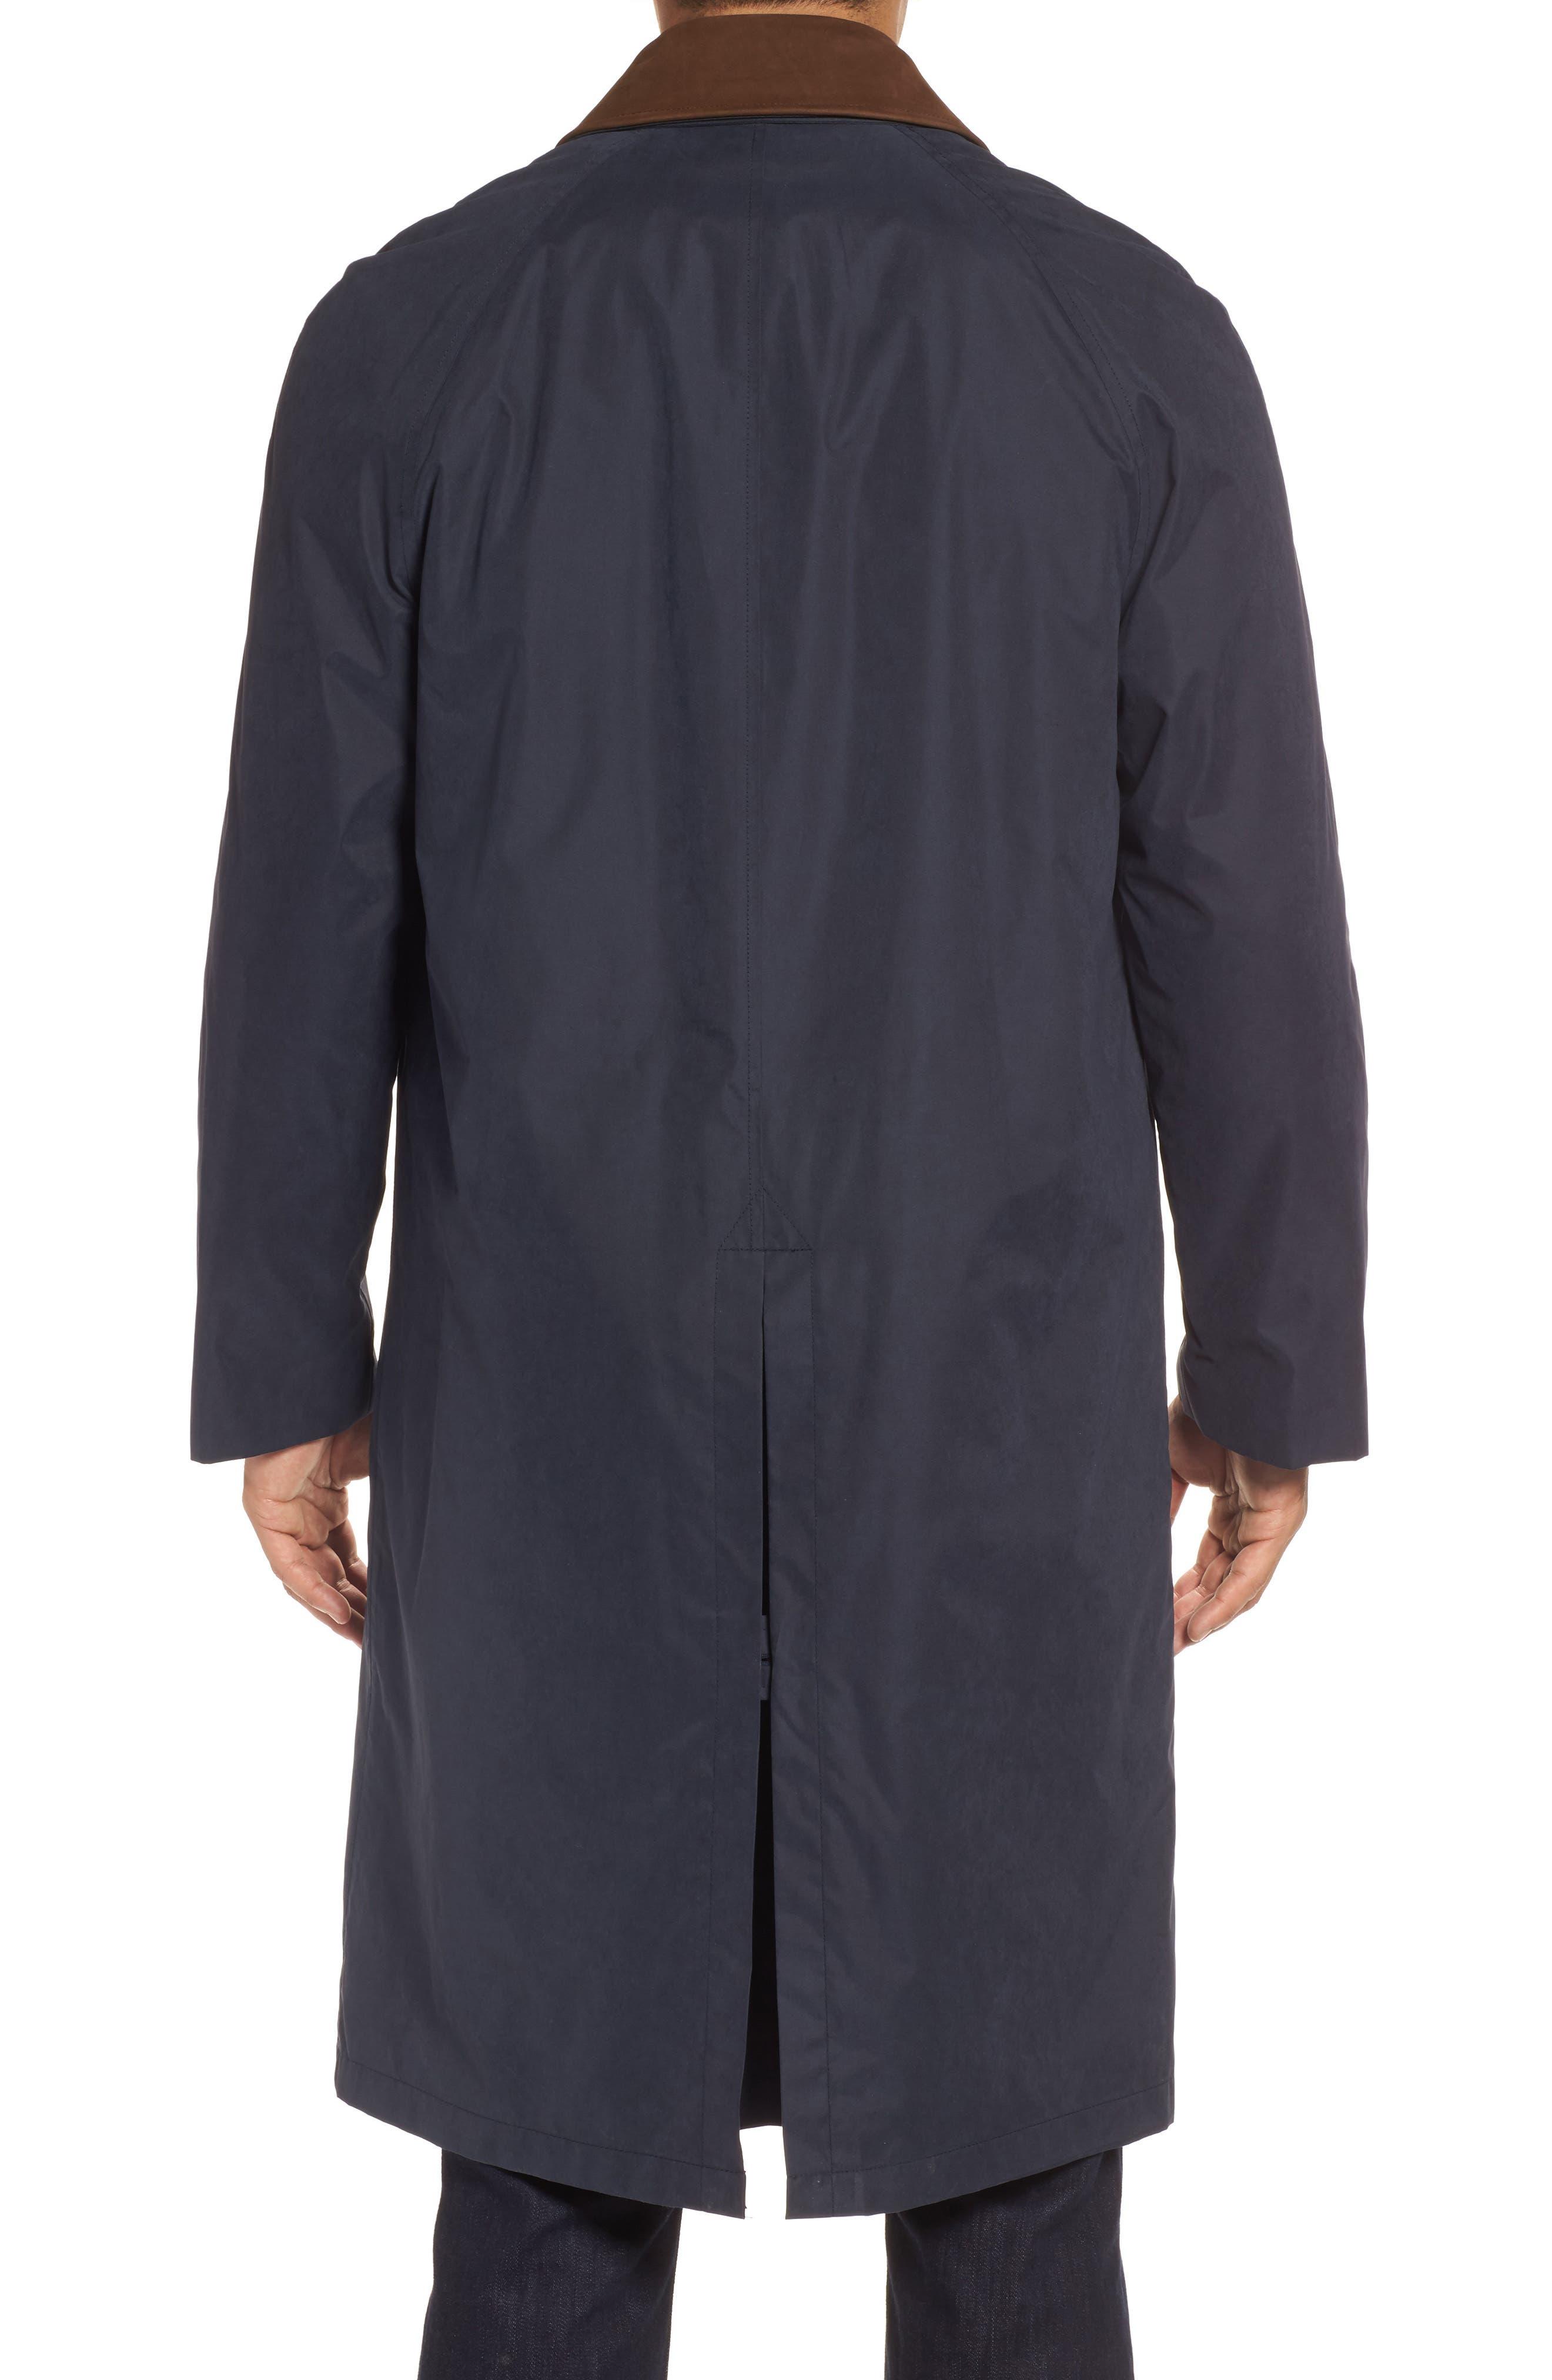 Lawrence Classic Fit Rain Coat,                             Alternate thumbnail 2, color,                             410